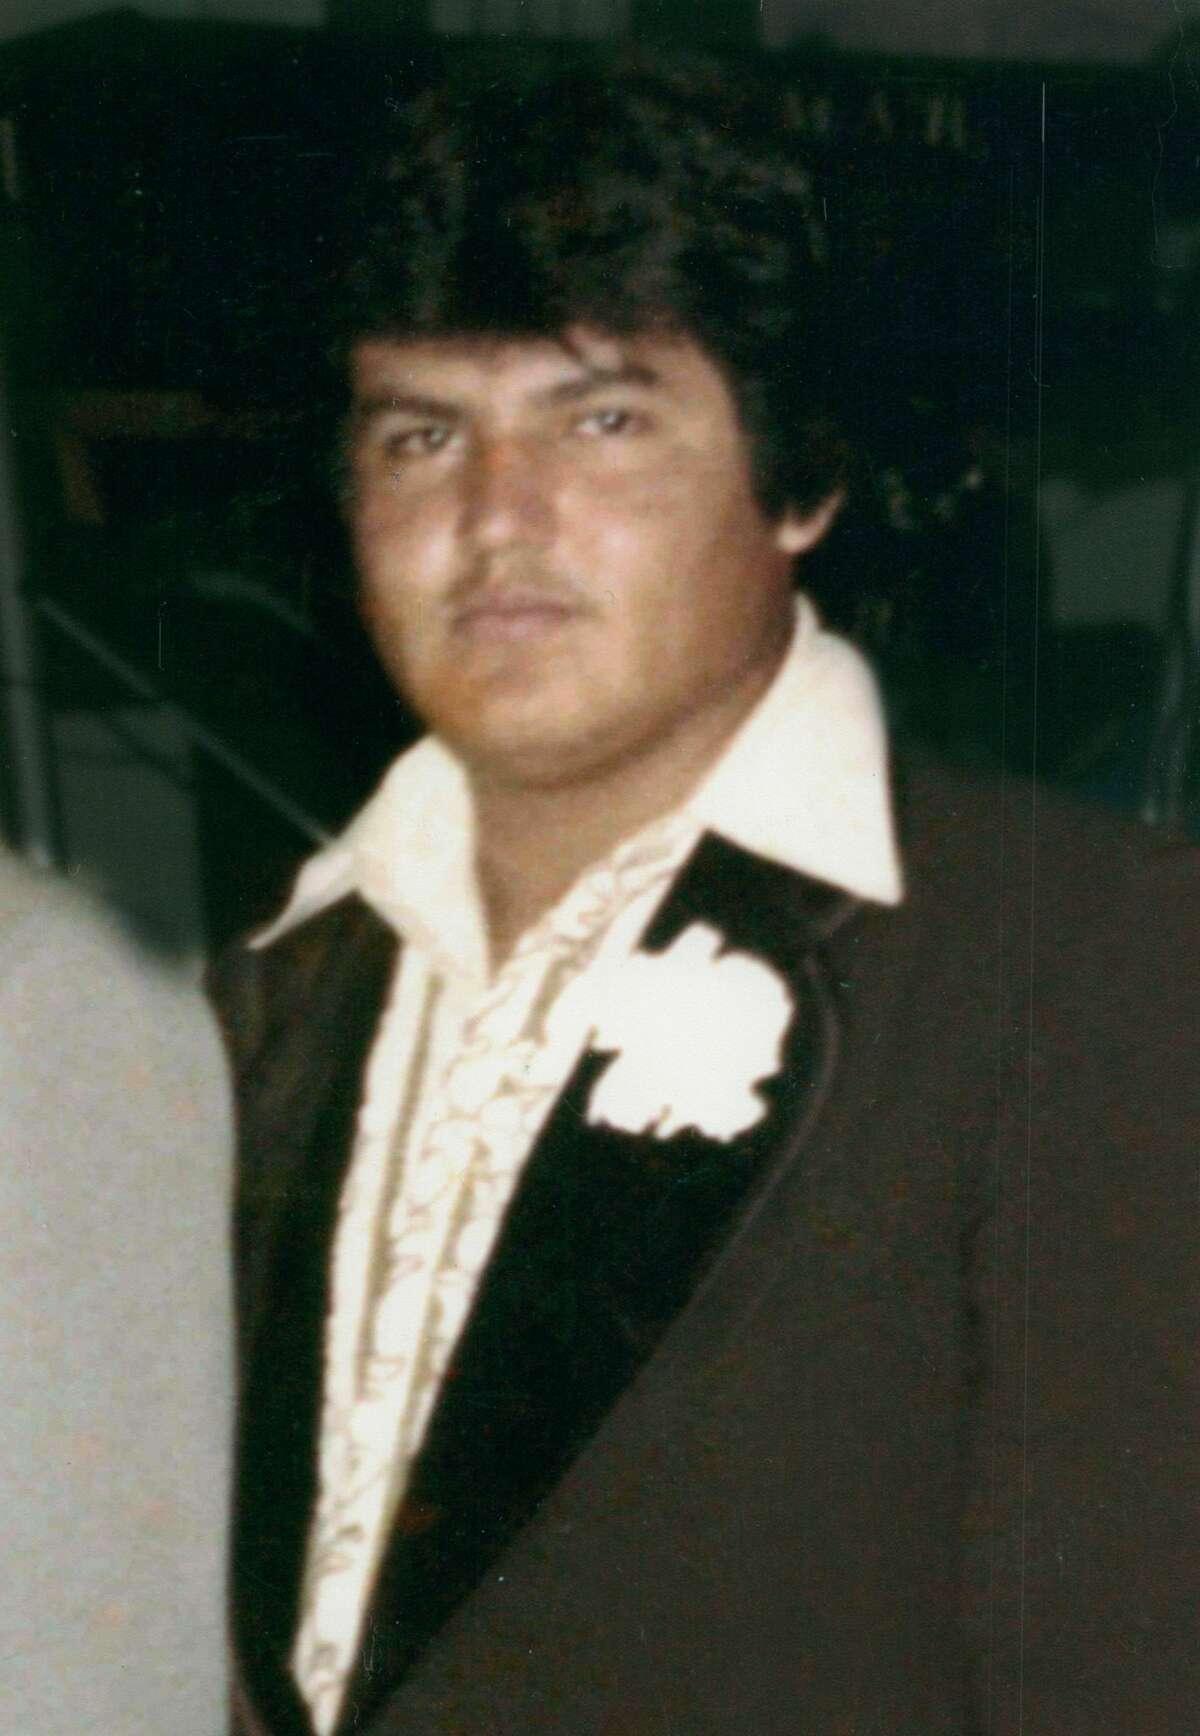 Humberto Garcia